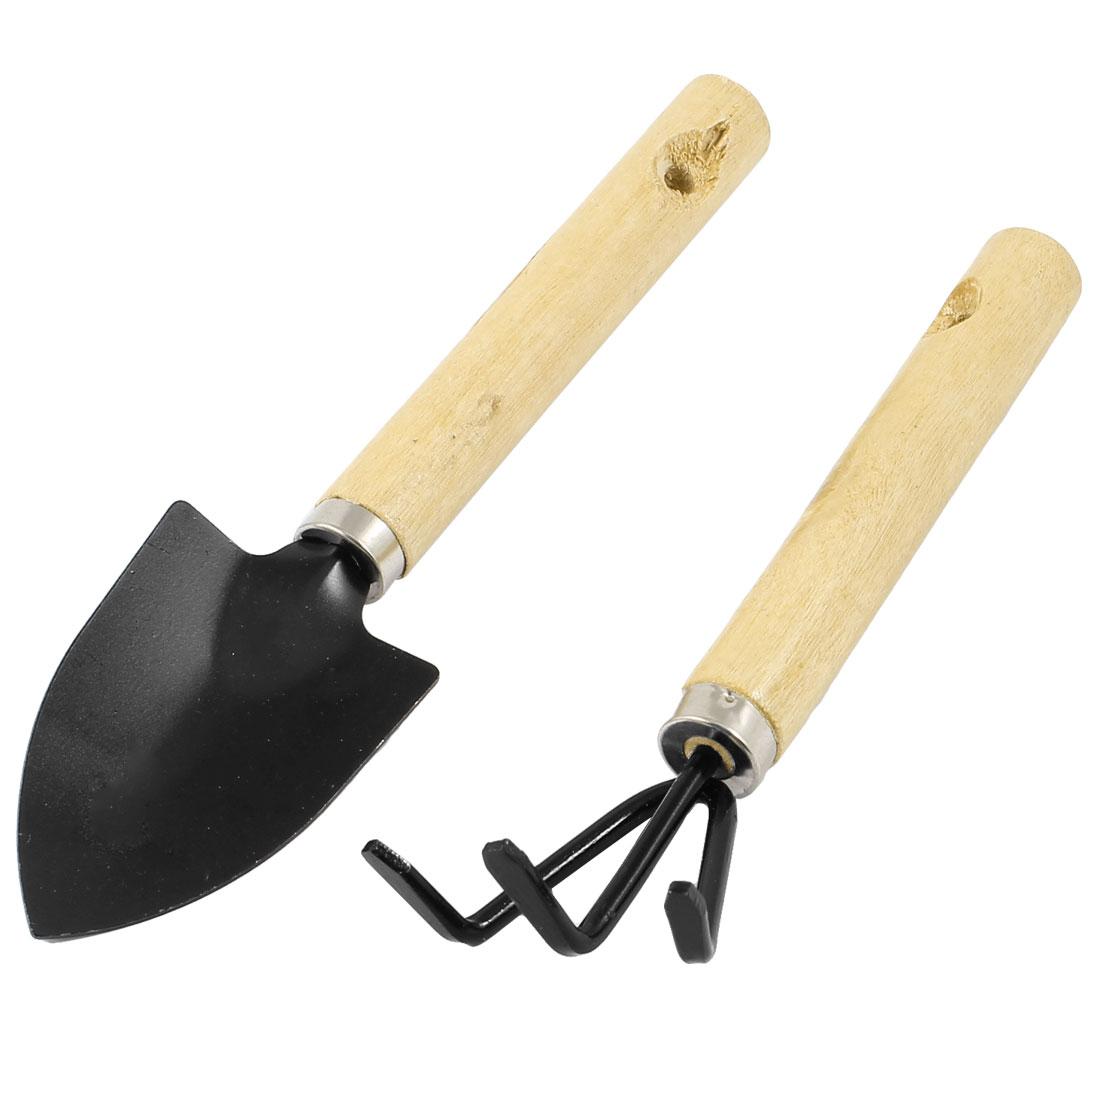 Gardening Horticulture Tools Wooden Grip Metal Rake Shovel 2 in 1 Set